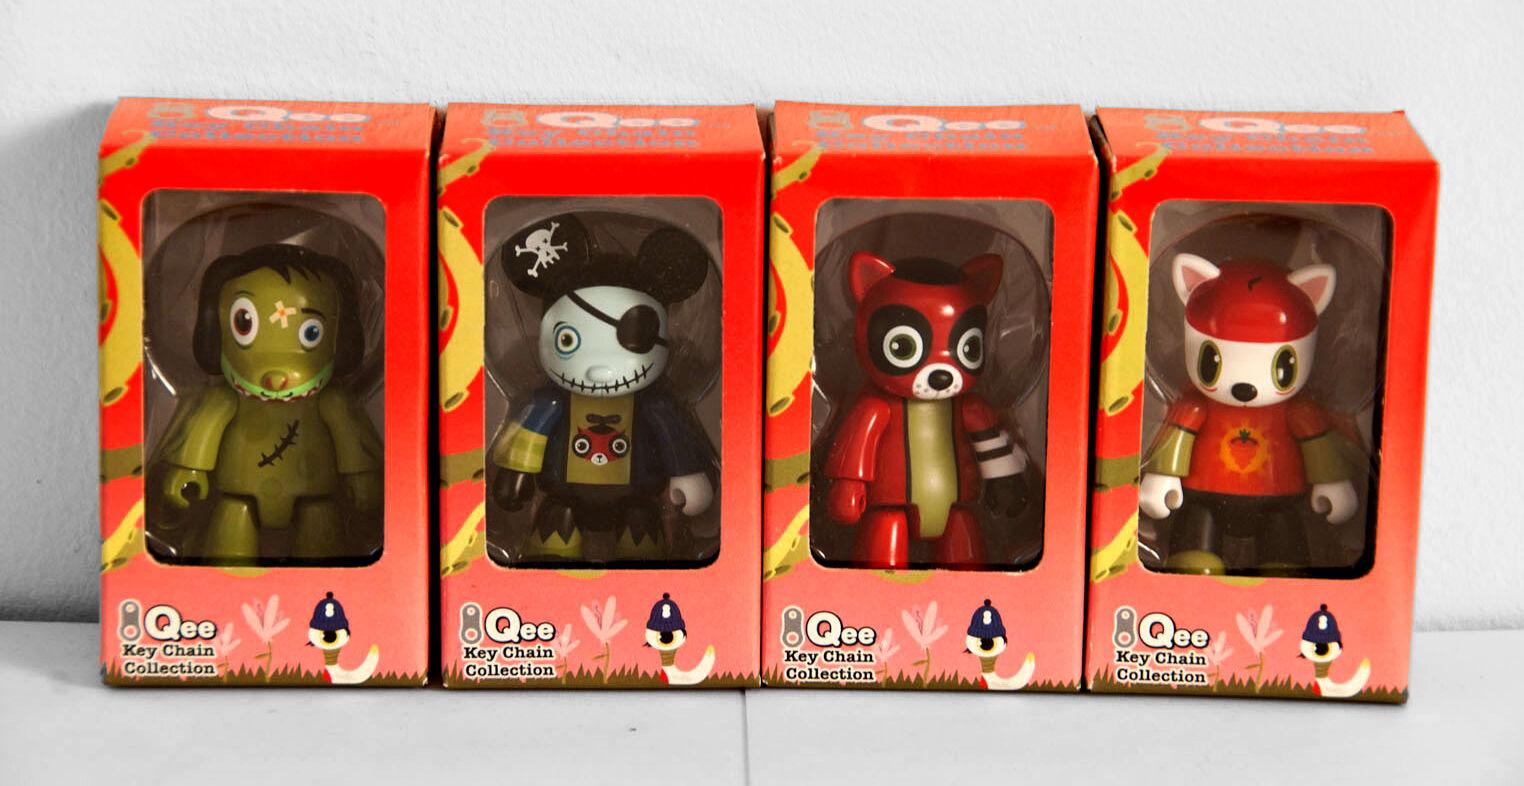 New - Qee - Scarygirl - 2.5 2.5 2.5  - Set of 4 - Toy2r - Kidrobot Street art urban lau 65104e